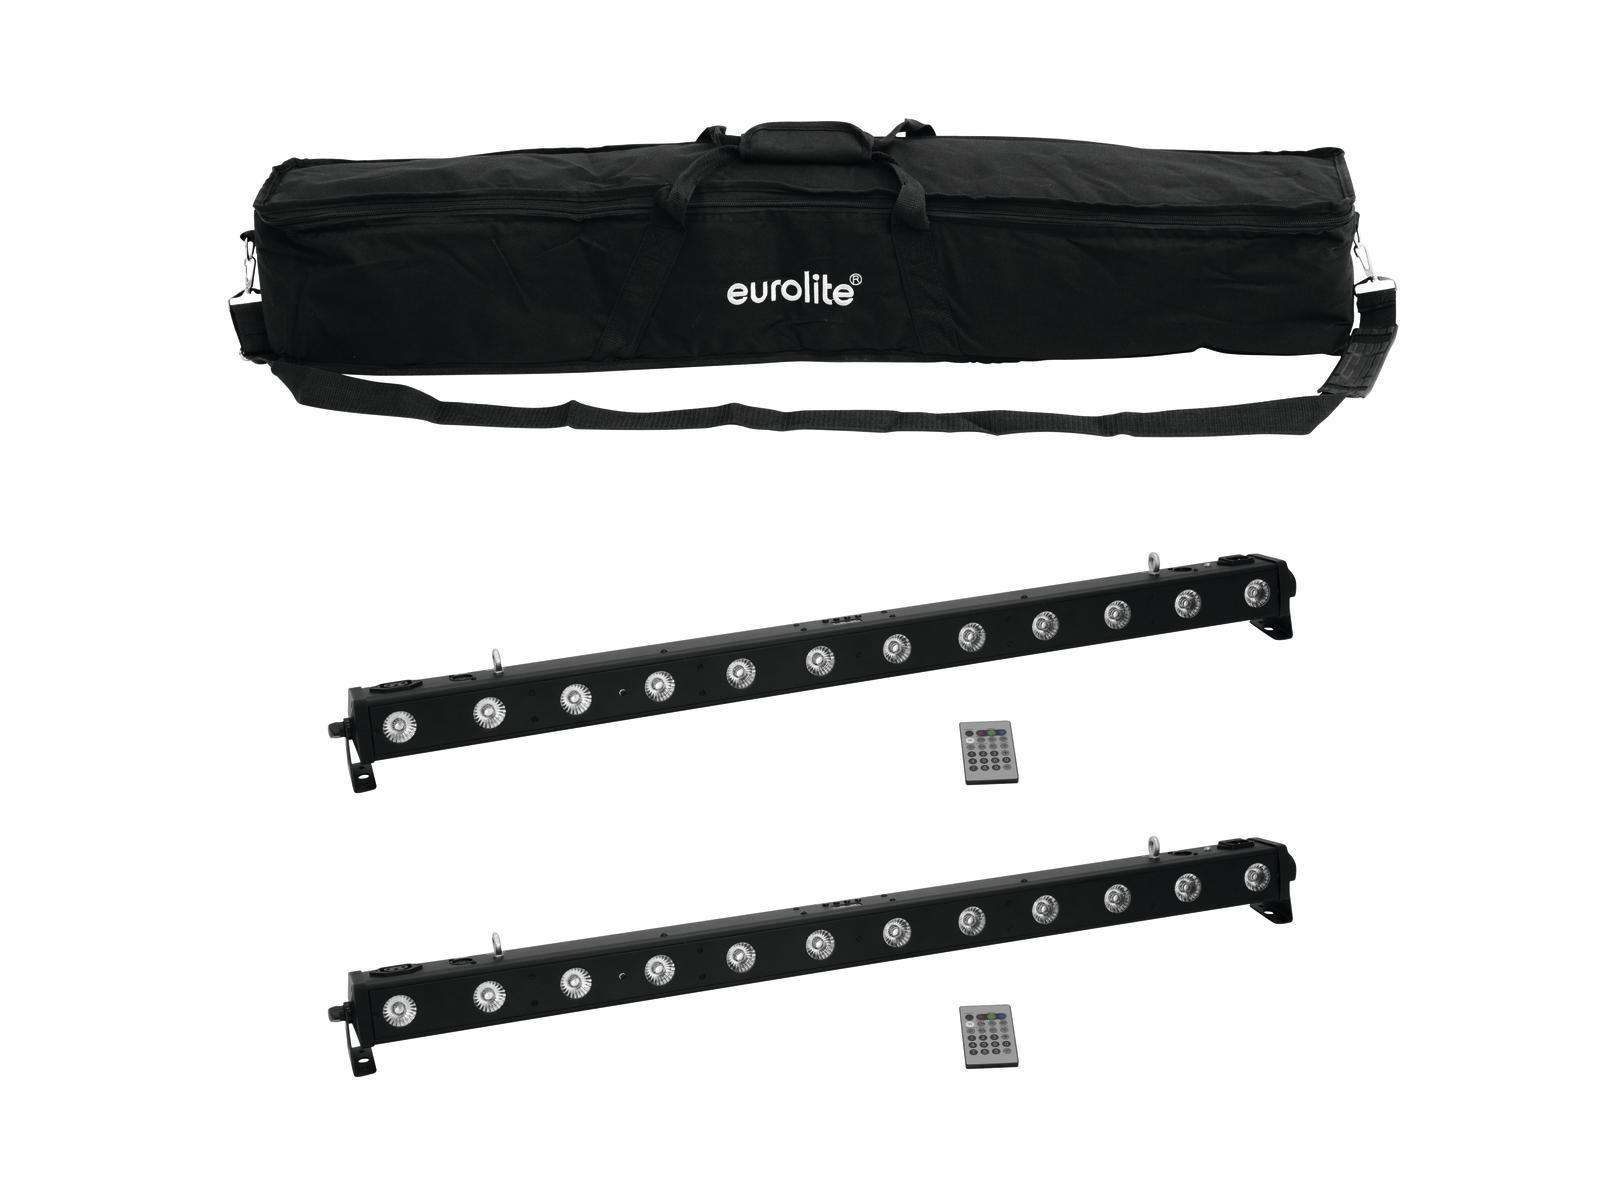 EUROLITE Set 2x LED BAR-1250 RGB+UV + Caso